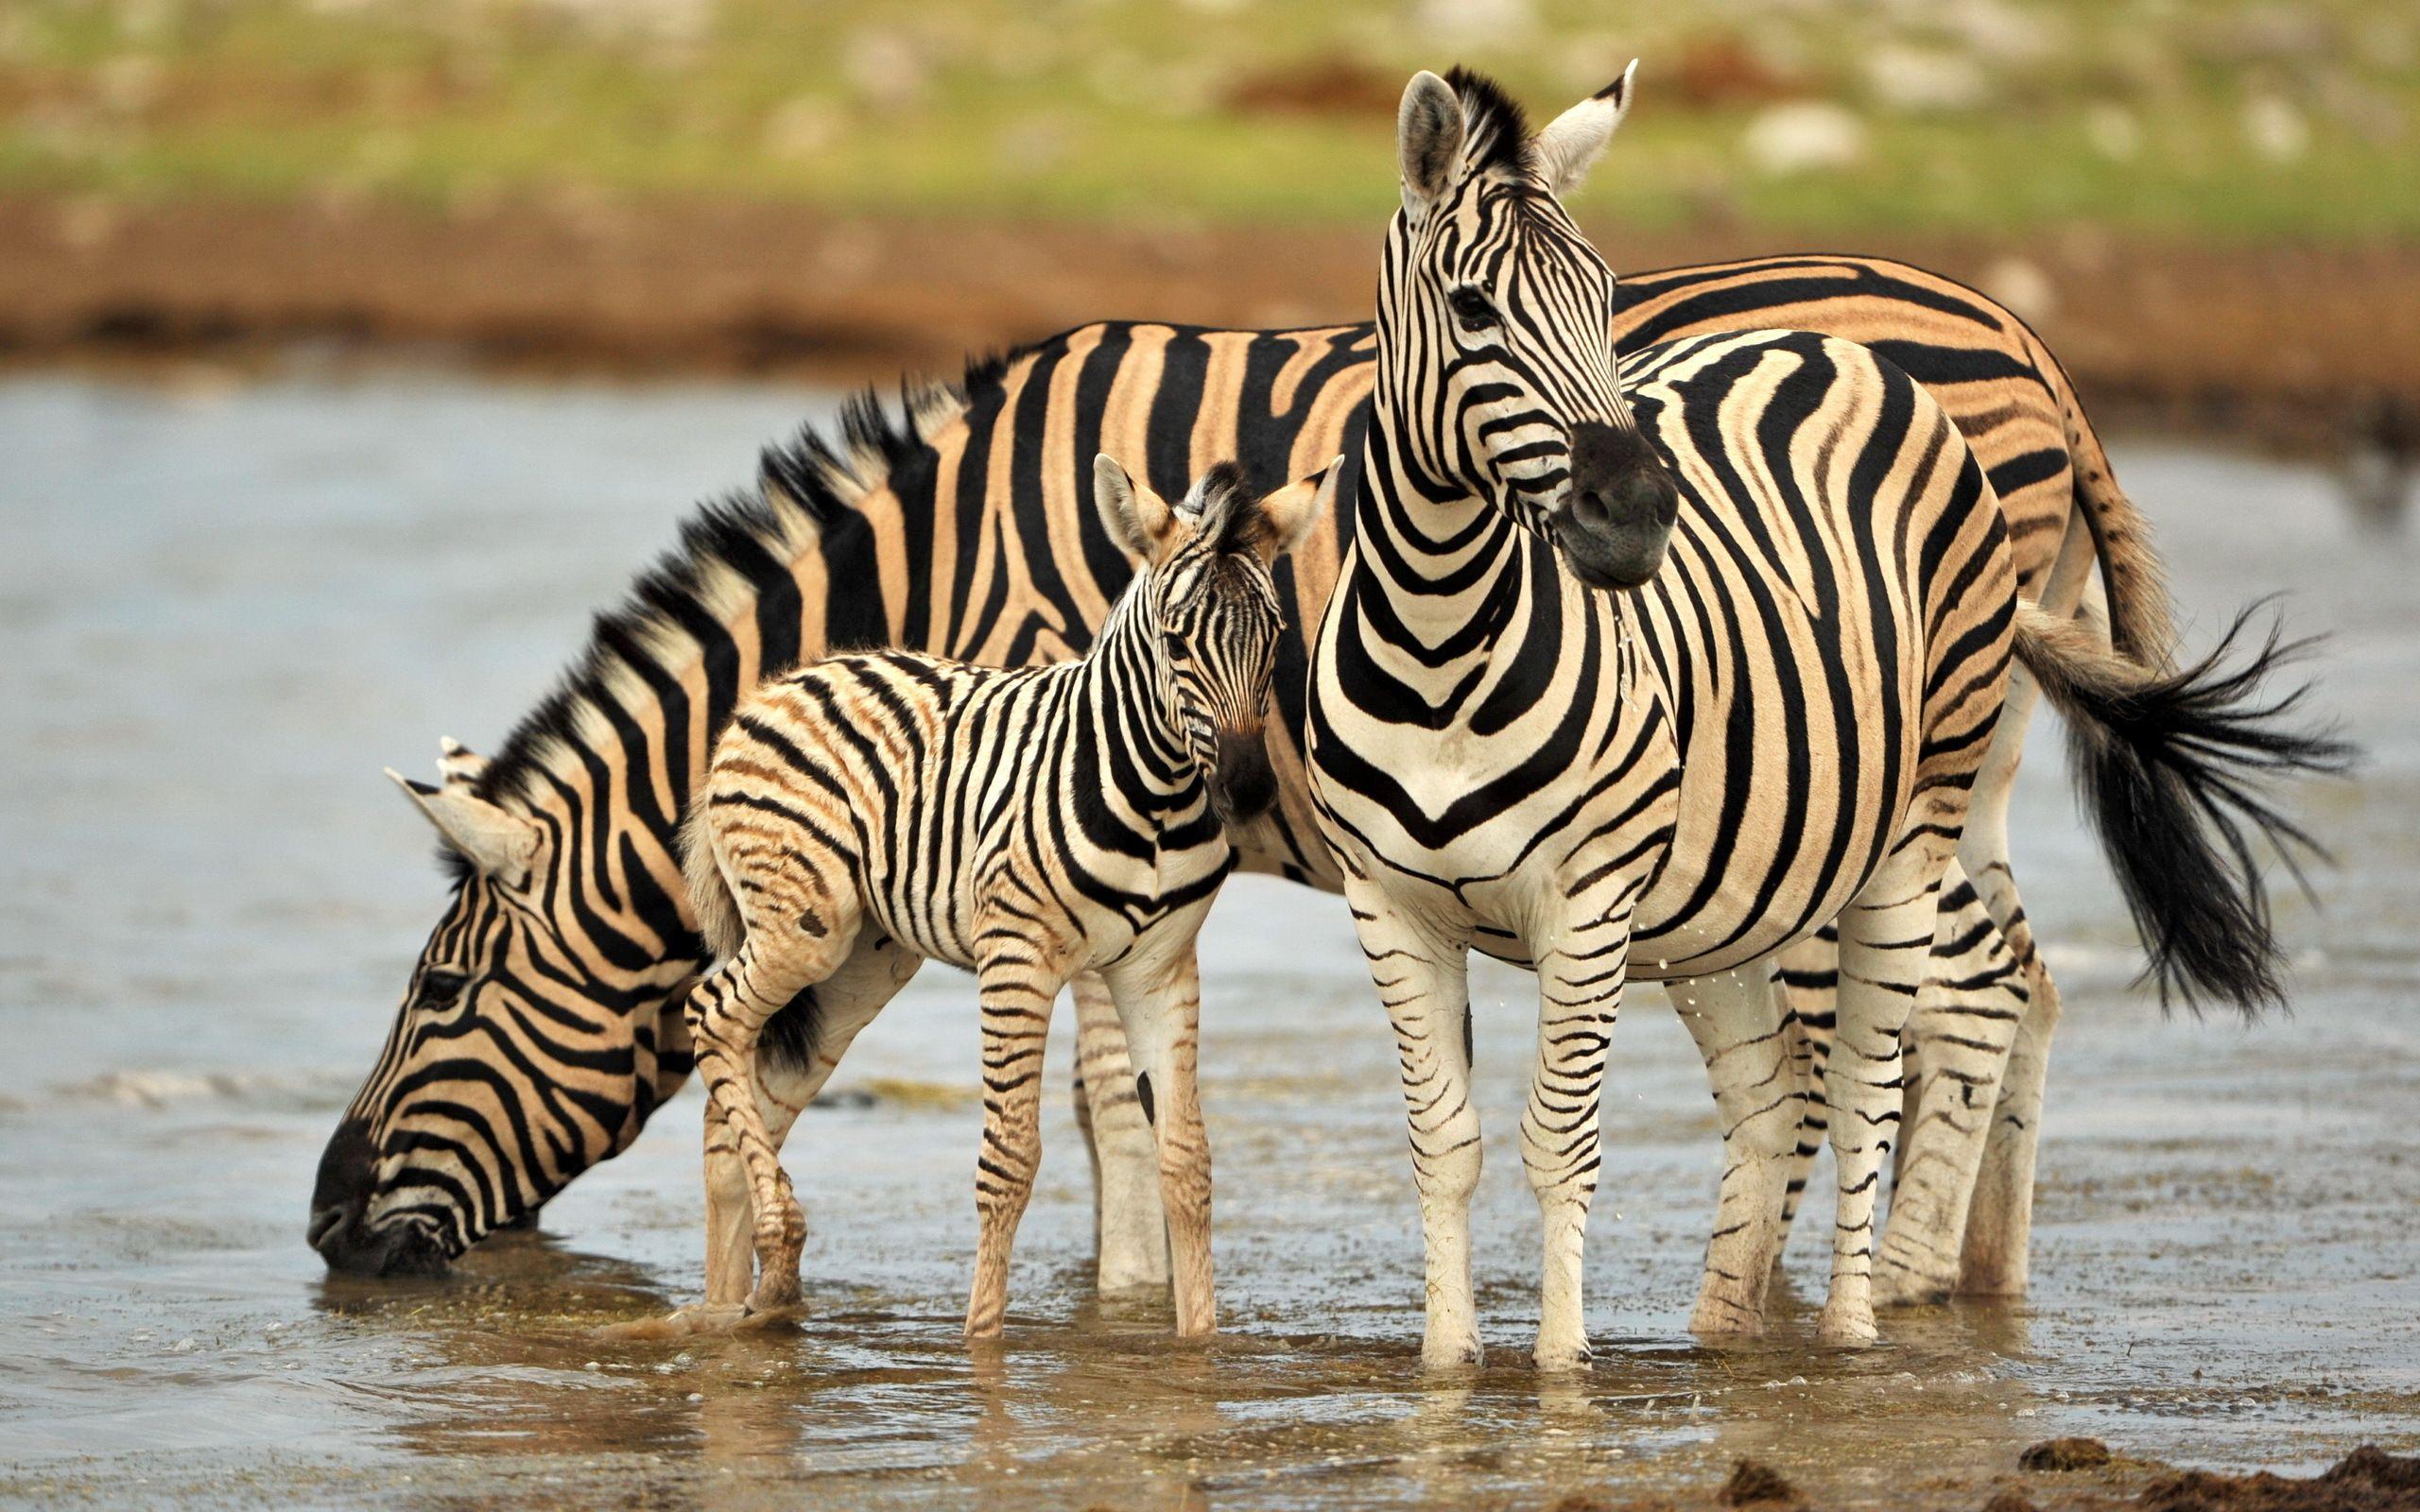 Cool zebra background image hd wallpaper Животные, Зебра